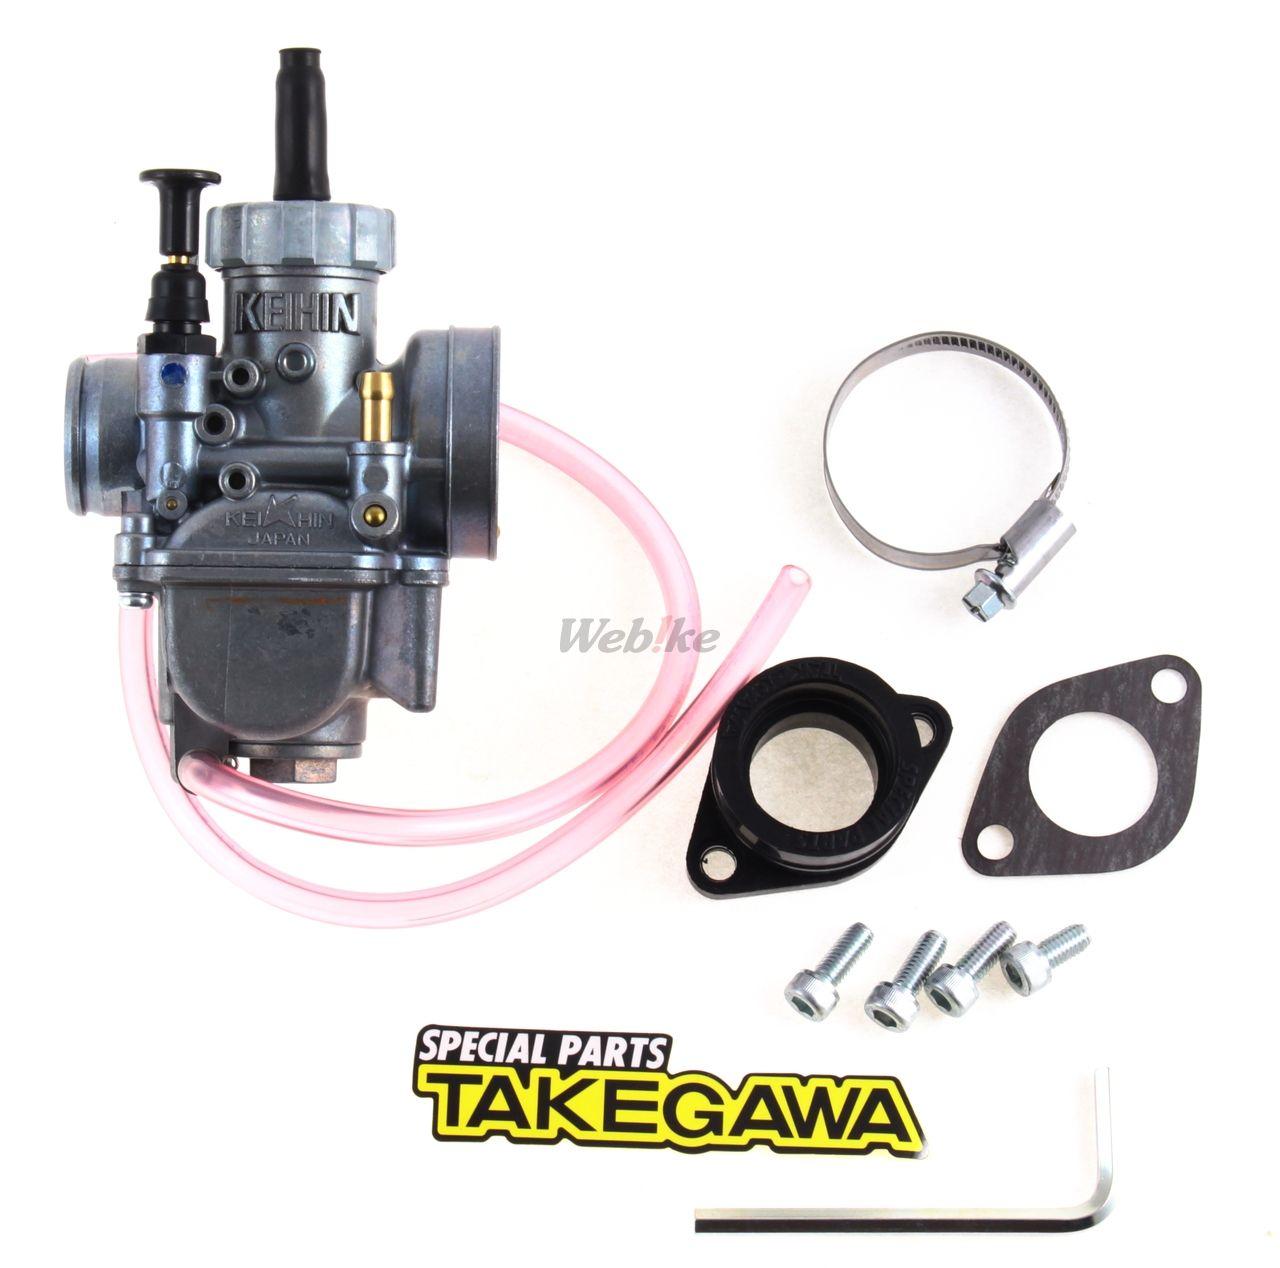 SP TAKEGAWA (Special Parts TAKEG : KEIHIN PE24 Carburetor